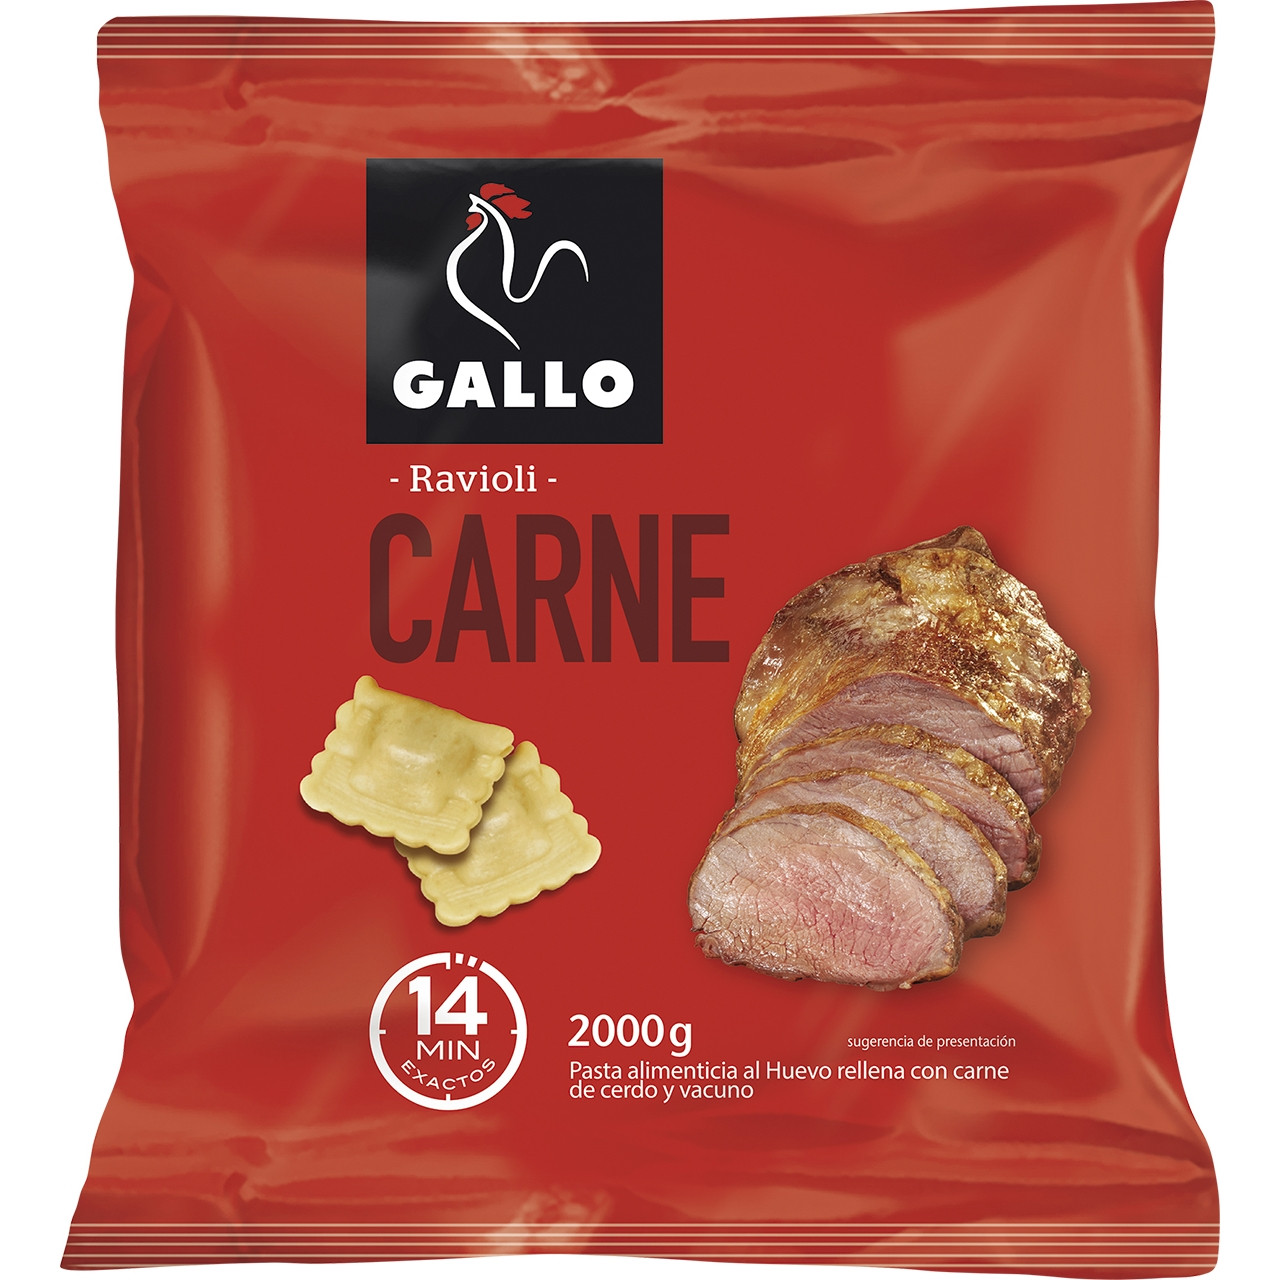 Ravioli carn Gallo